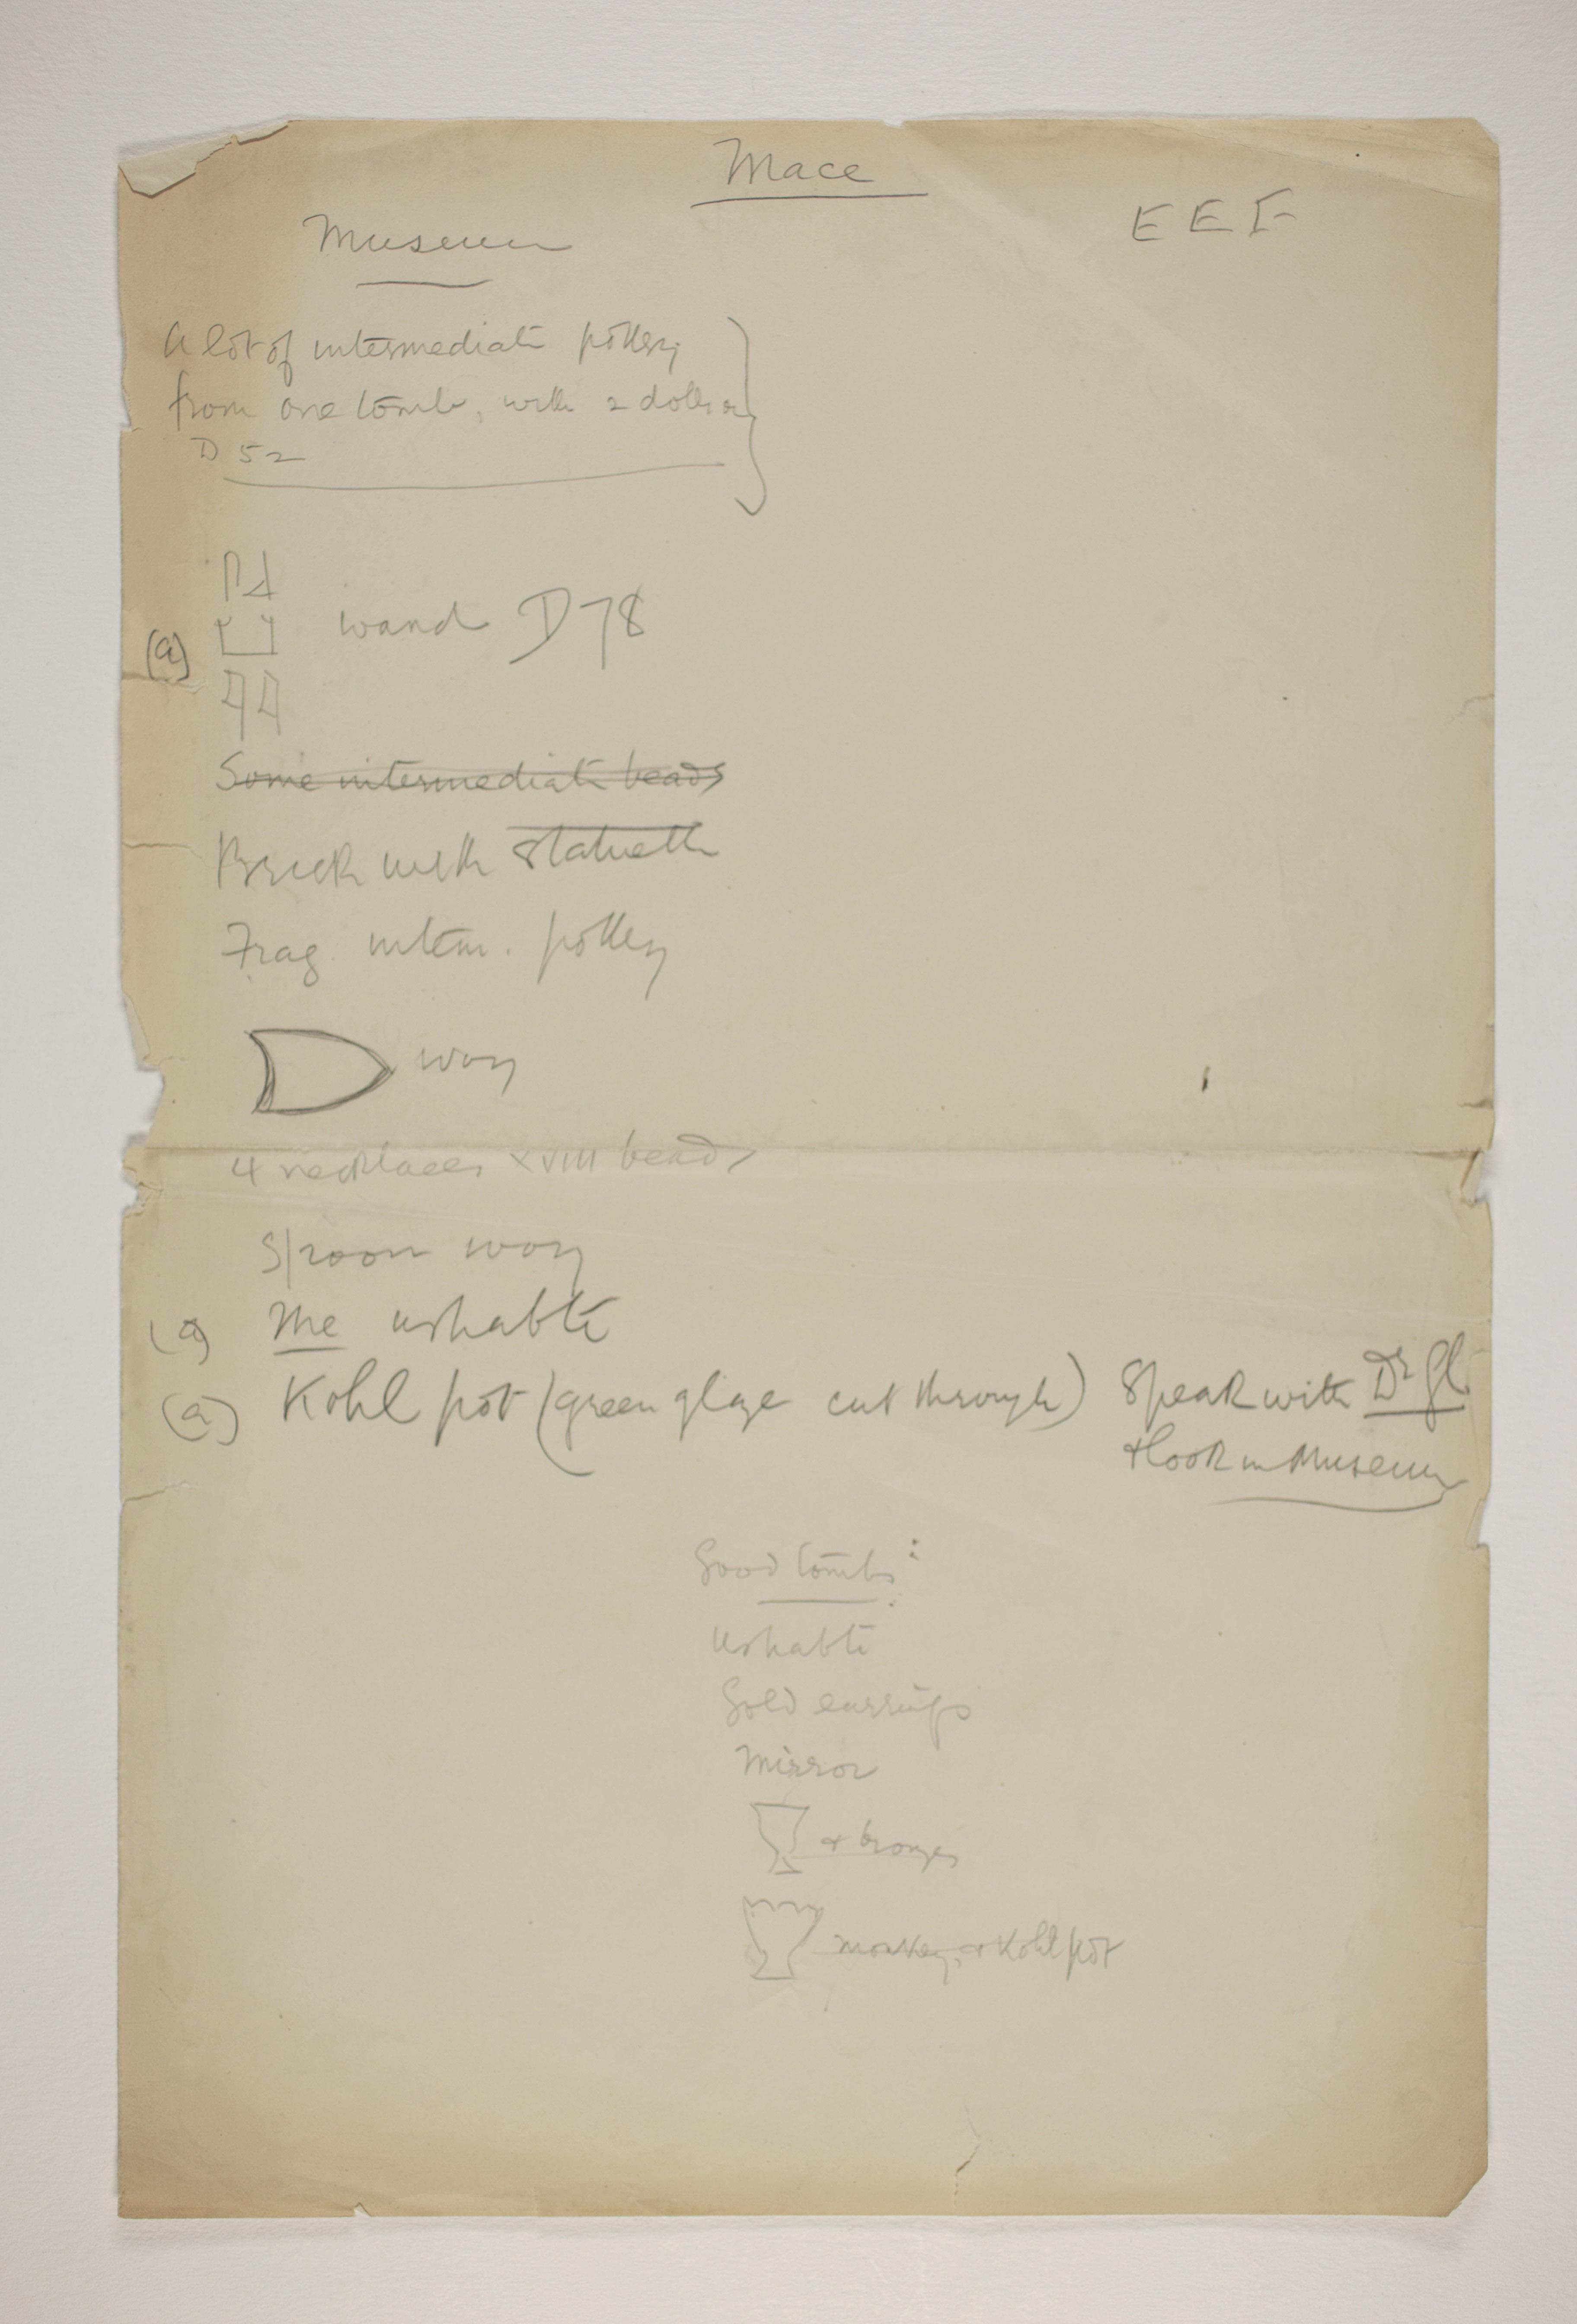 Abydos, Bet Khallaf, el-Mahasna 1900-1901, Distribution List, PMA/WFP1/D/9/2